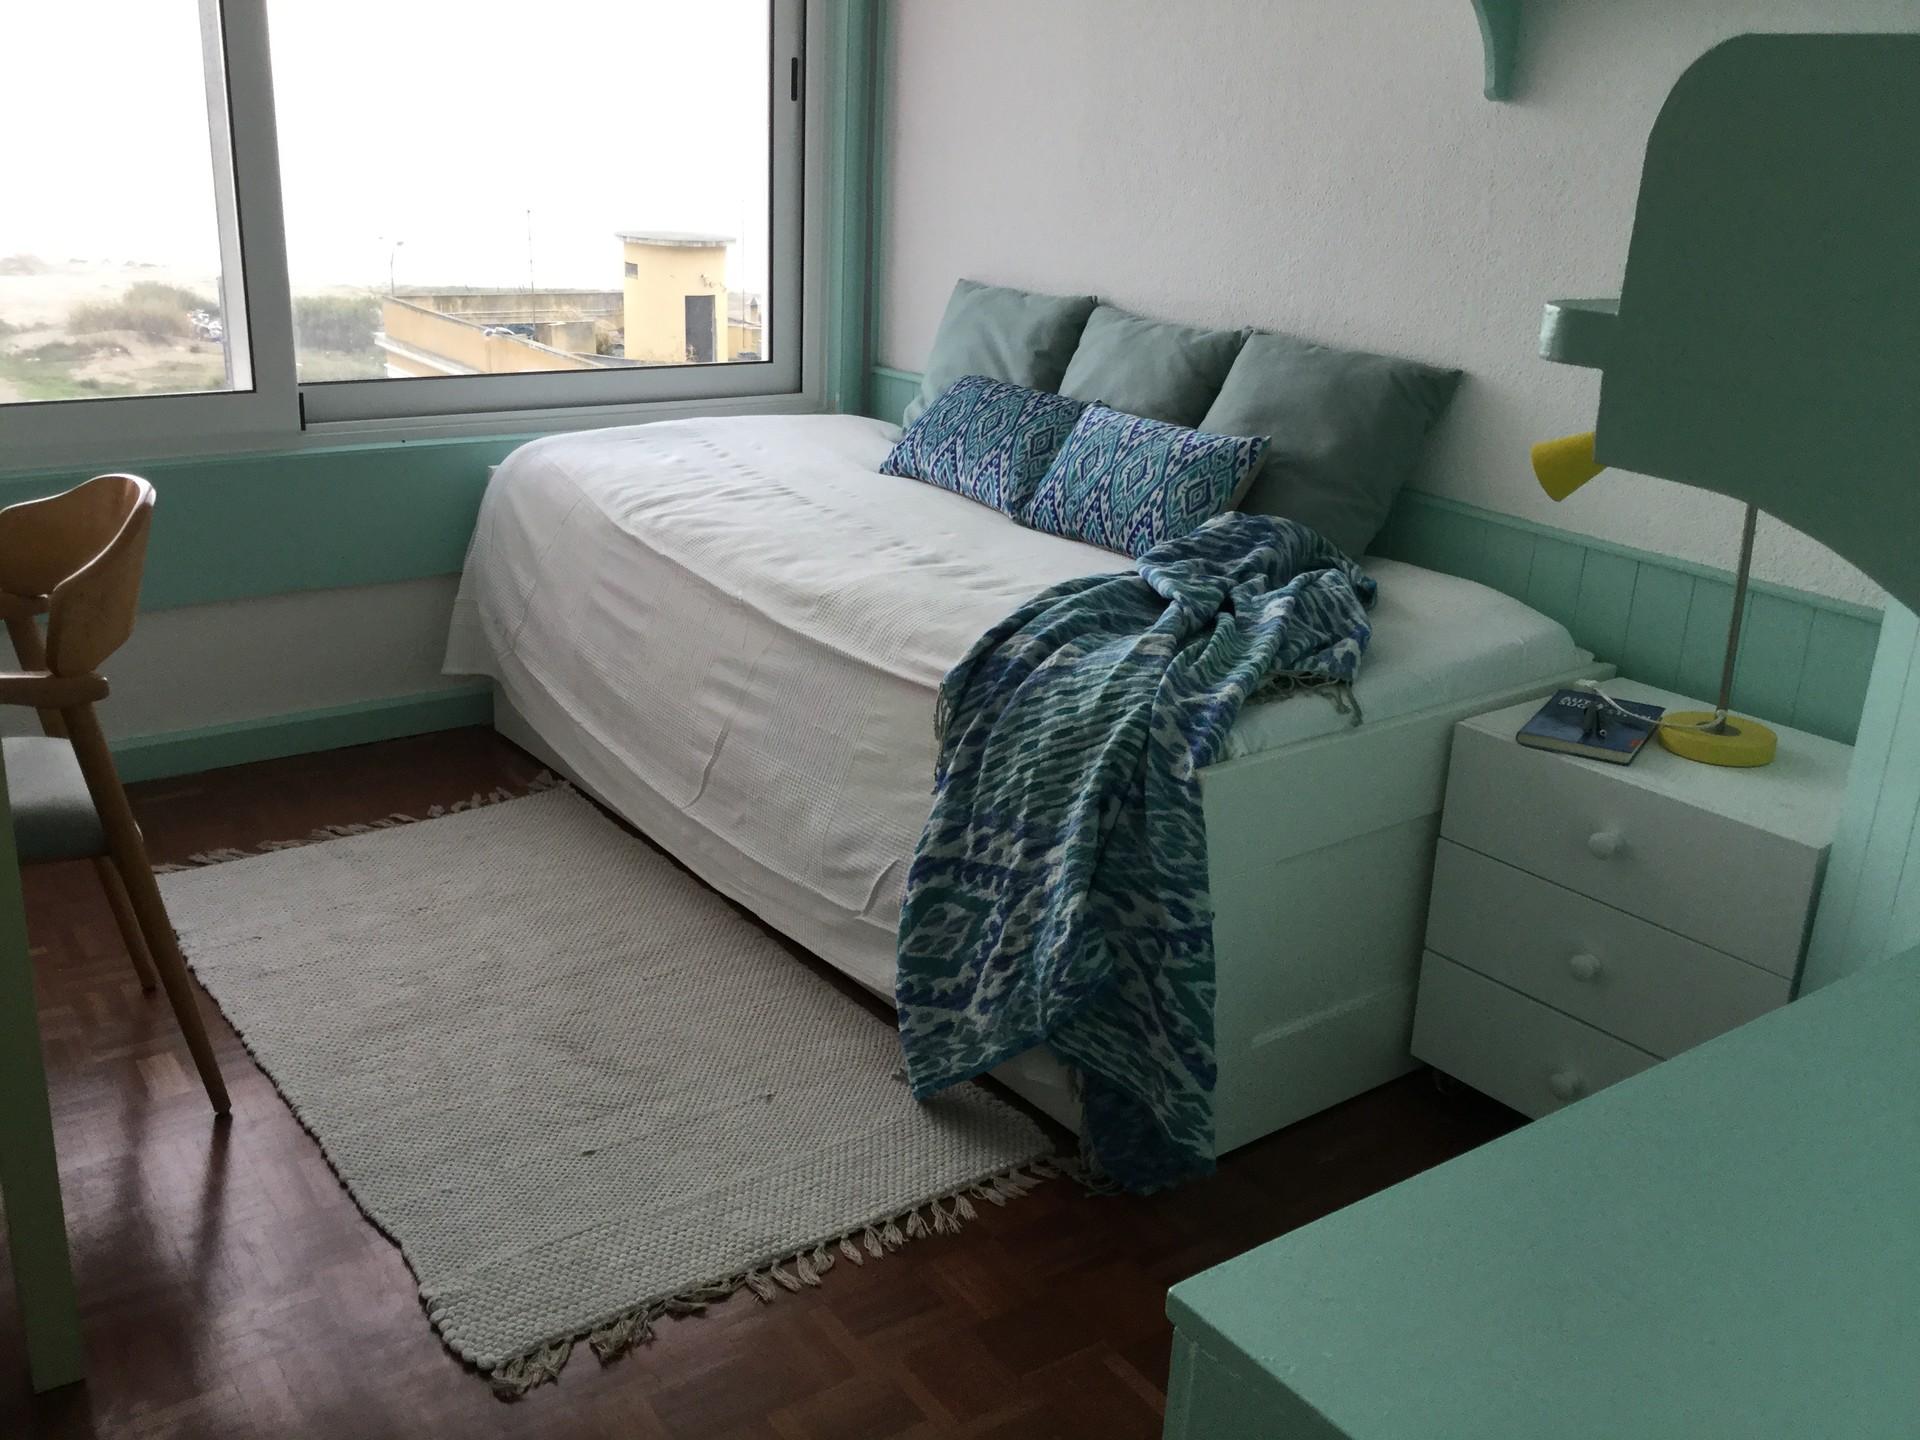 modern-room-apartment-river-view-b50802d0e2934f27da17df0ca01925eb